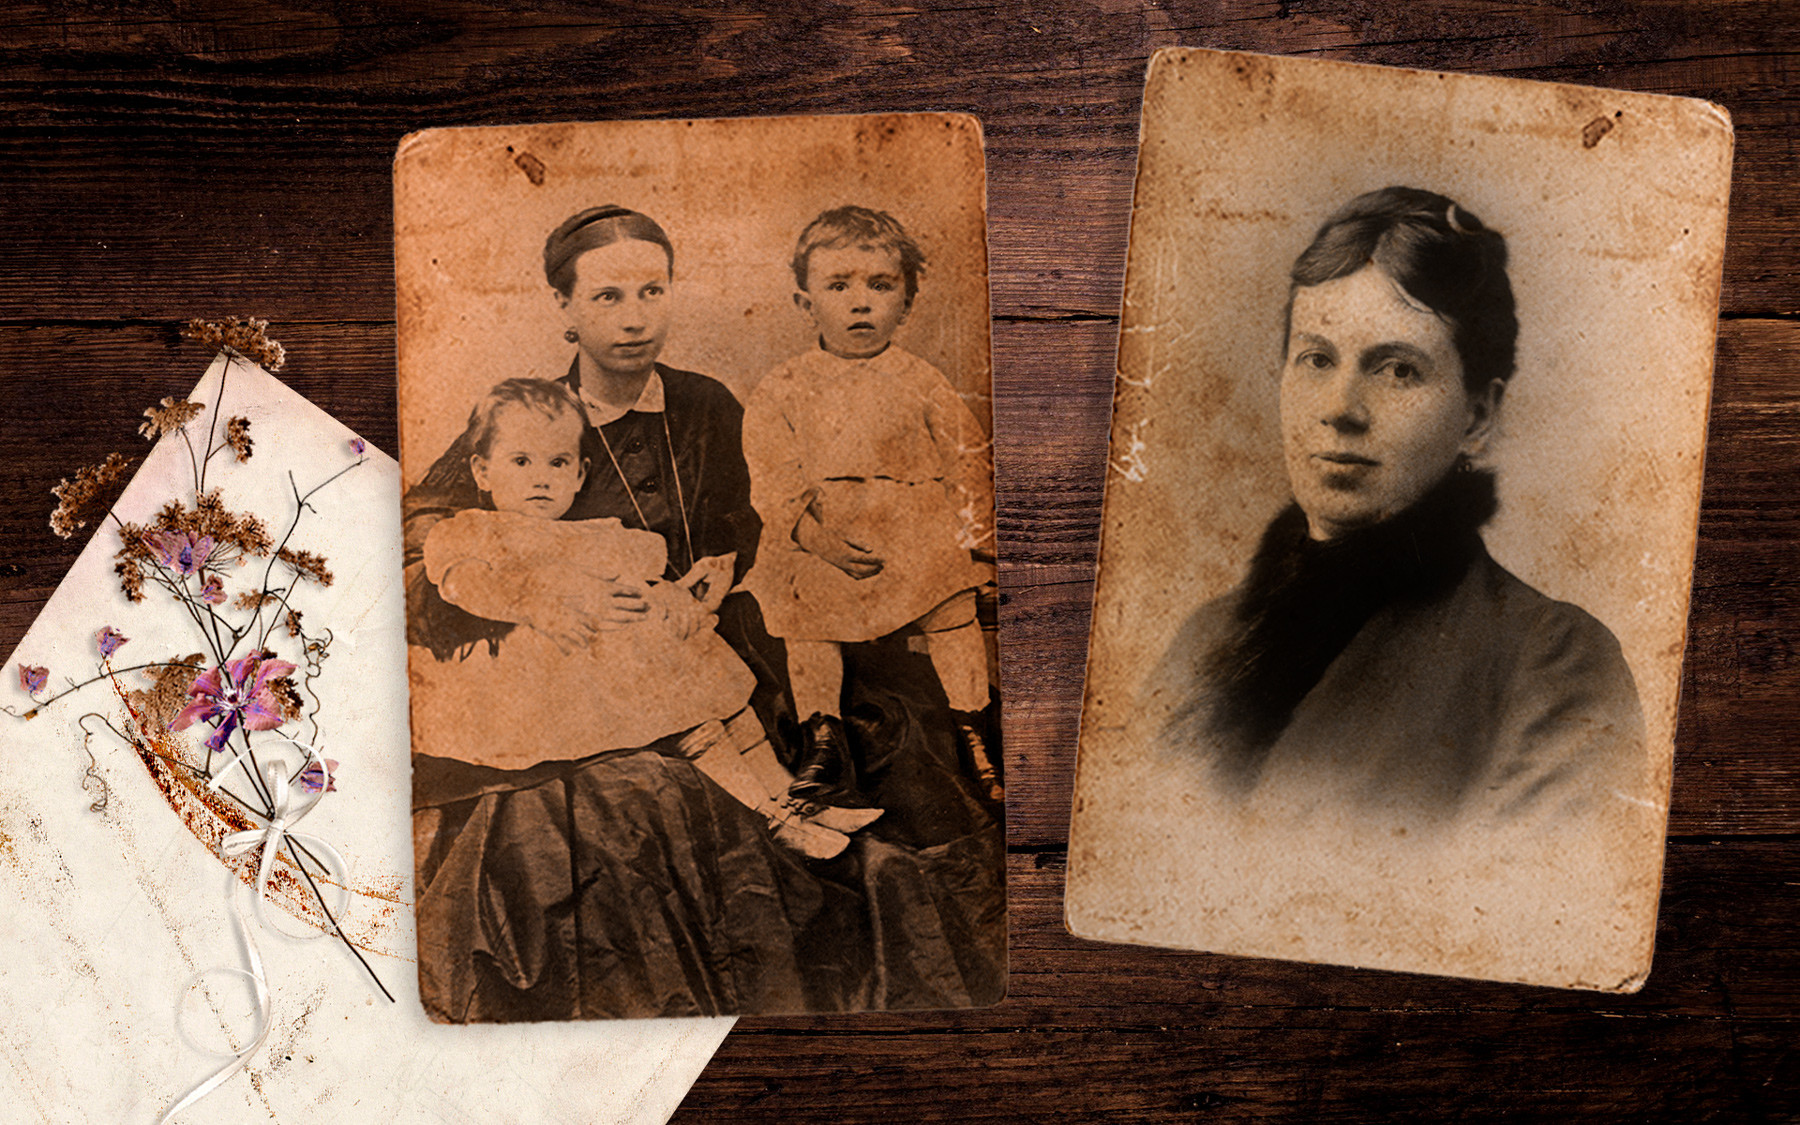 Съпругата на писателя Лев Николаевич Толстой, София Андреевна Толстая, с децата им Таня и Сергей . 1866 г., репродукция